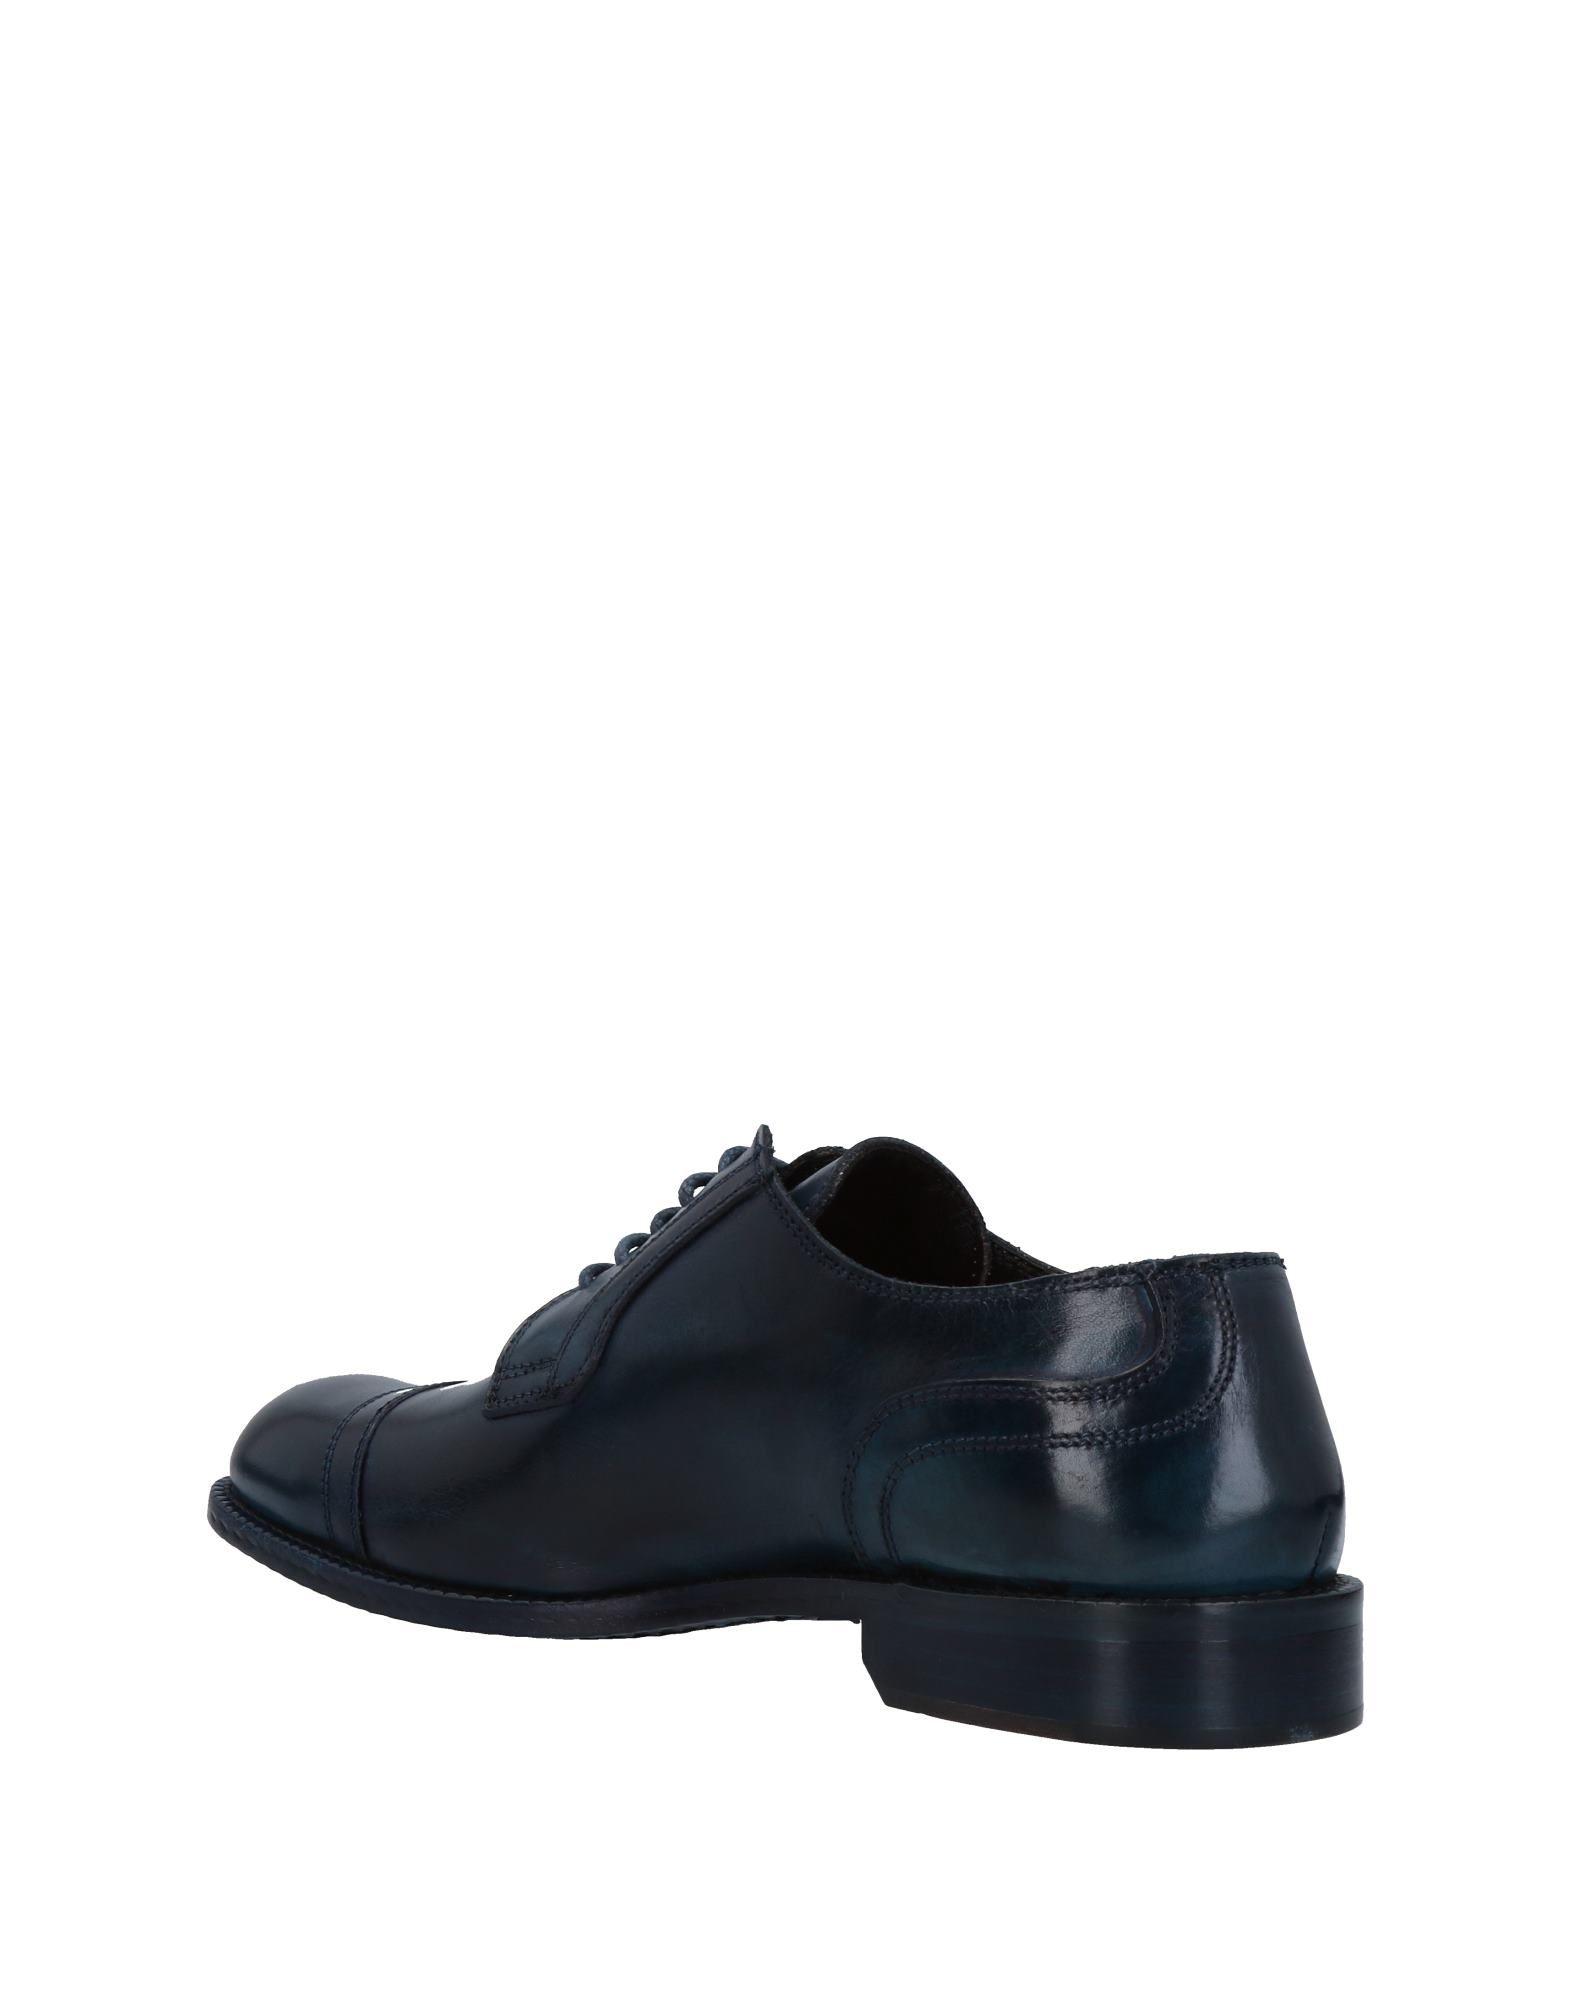 CHAUSSURES - Chaussures à lacetsRichard Lars 5Elbr